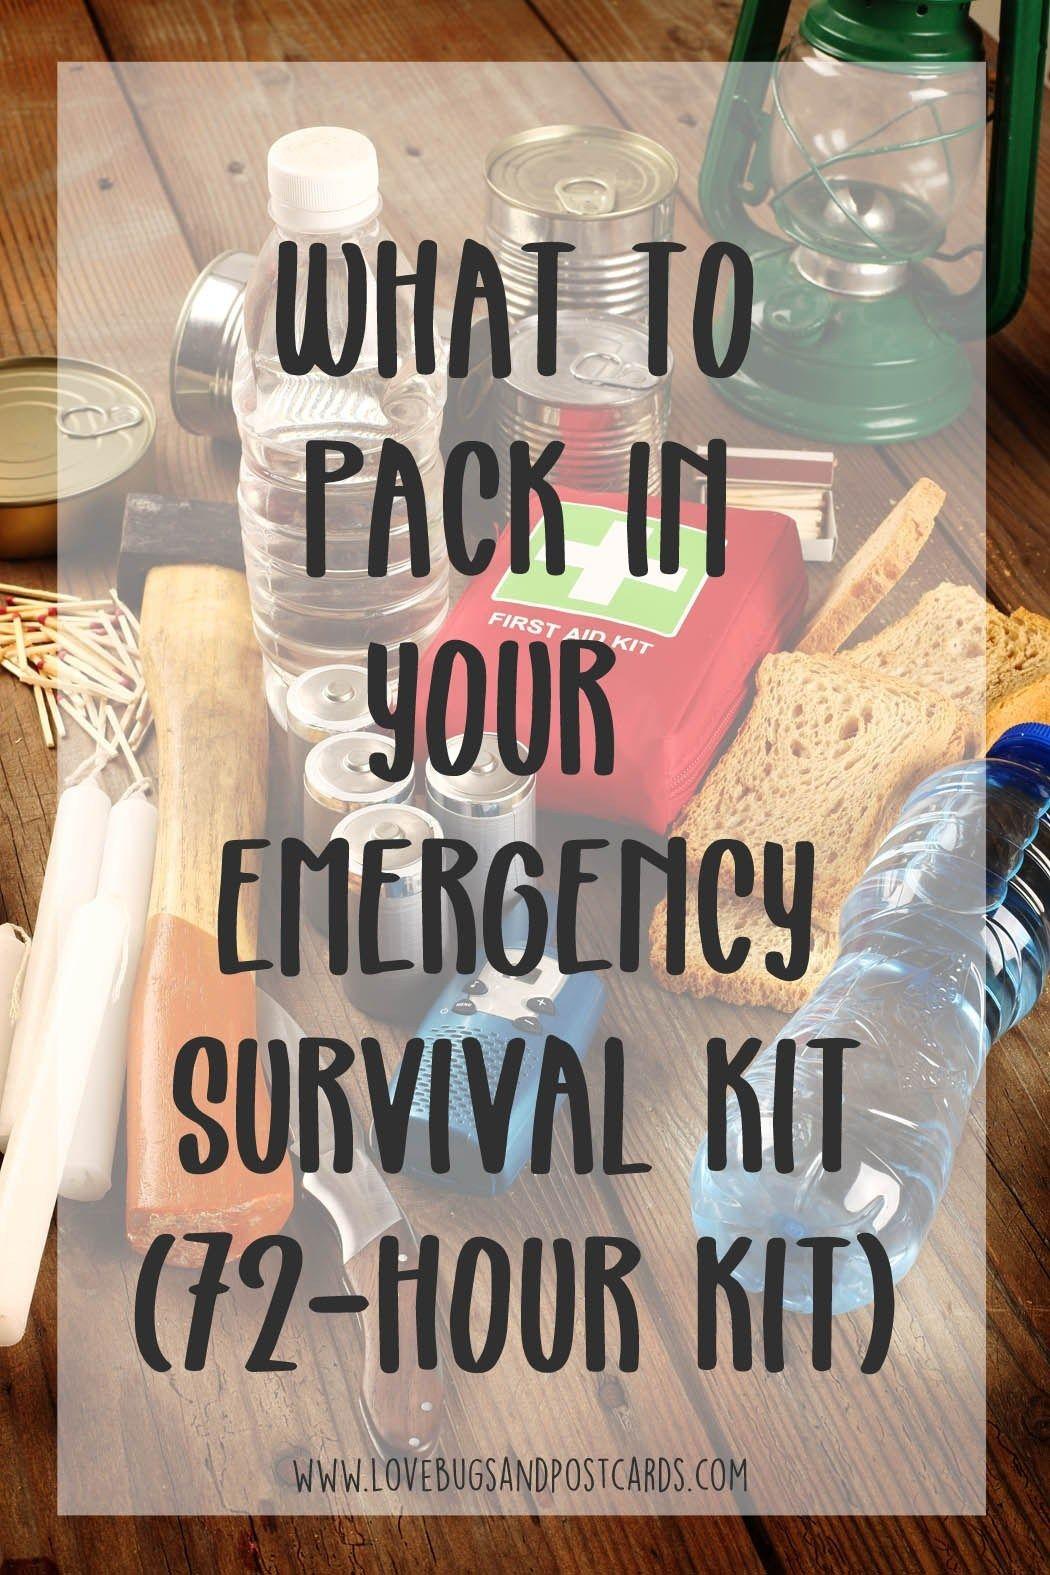 Emergency kit checklist printable 72hour kit lovebugs